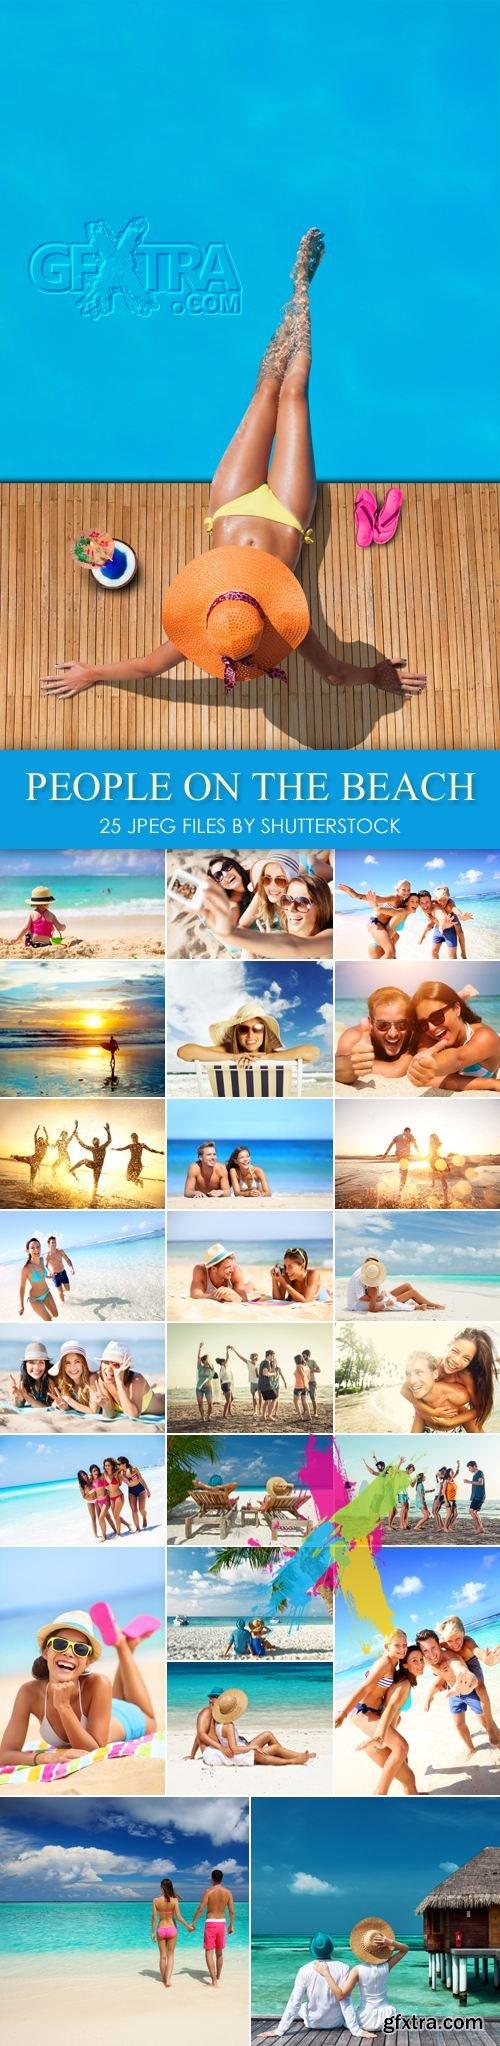 Stock Photo - People on the Beach